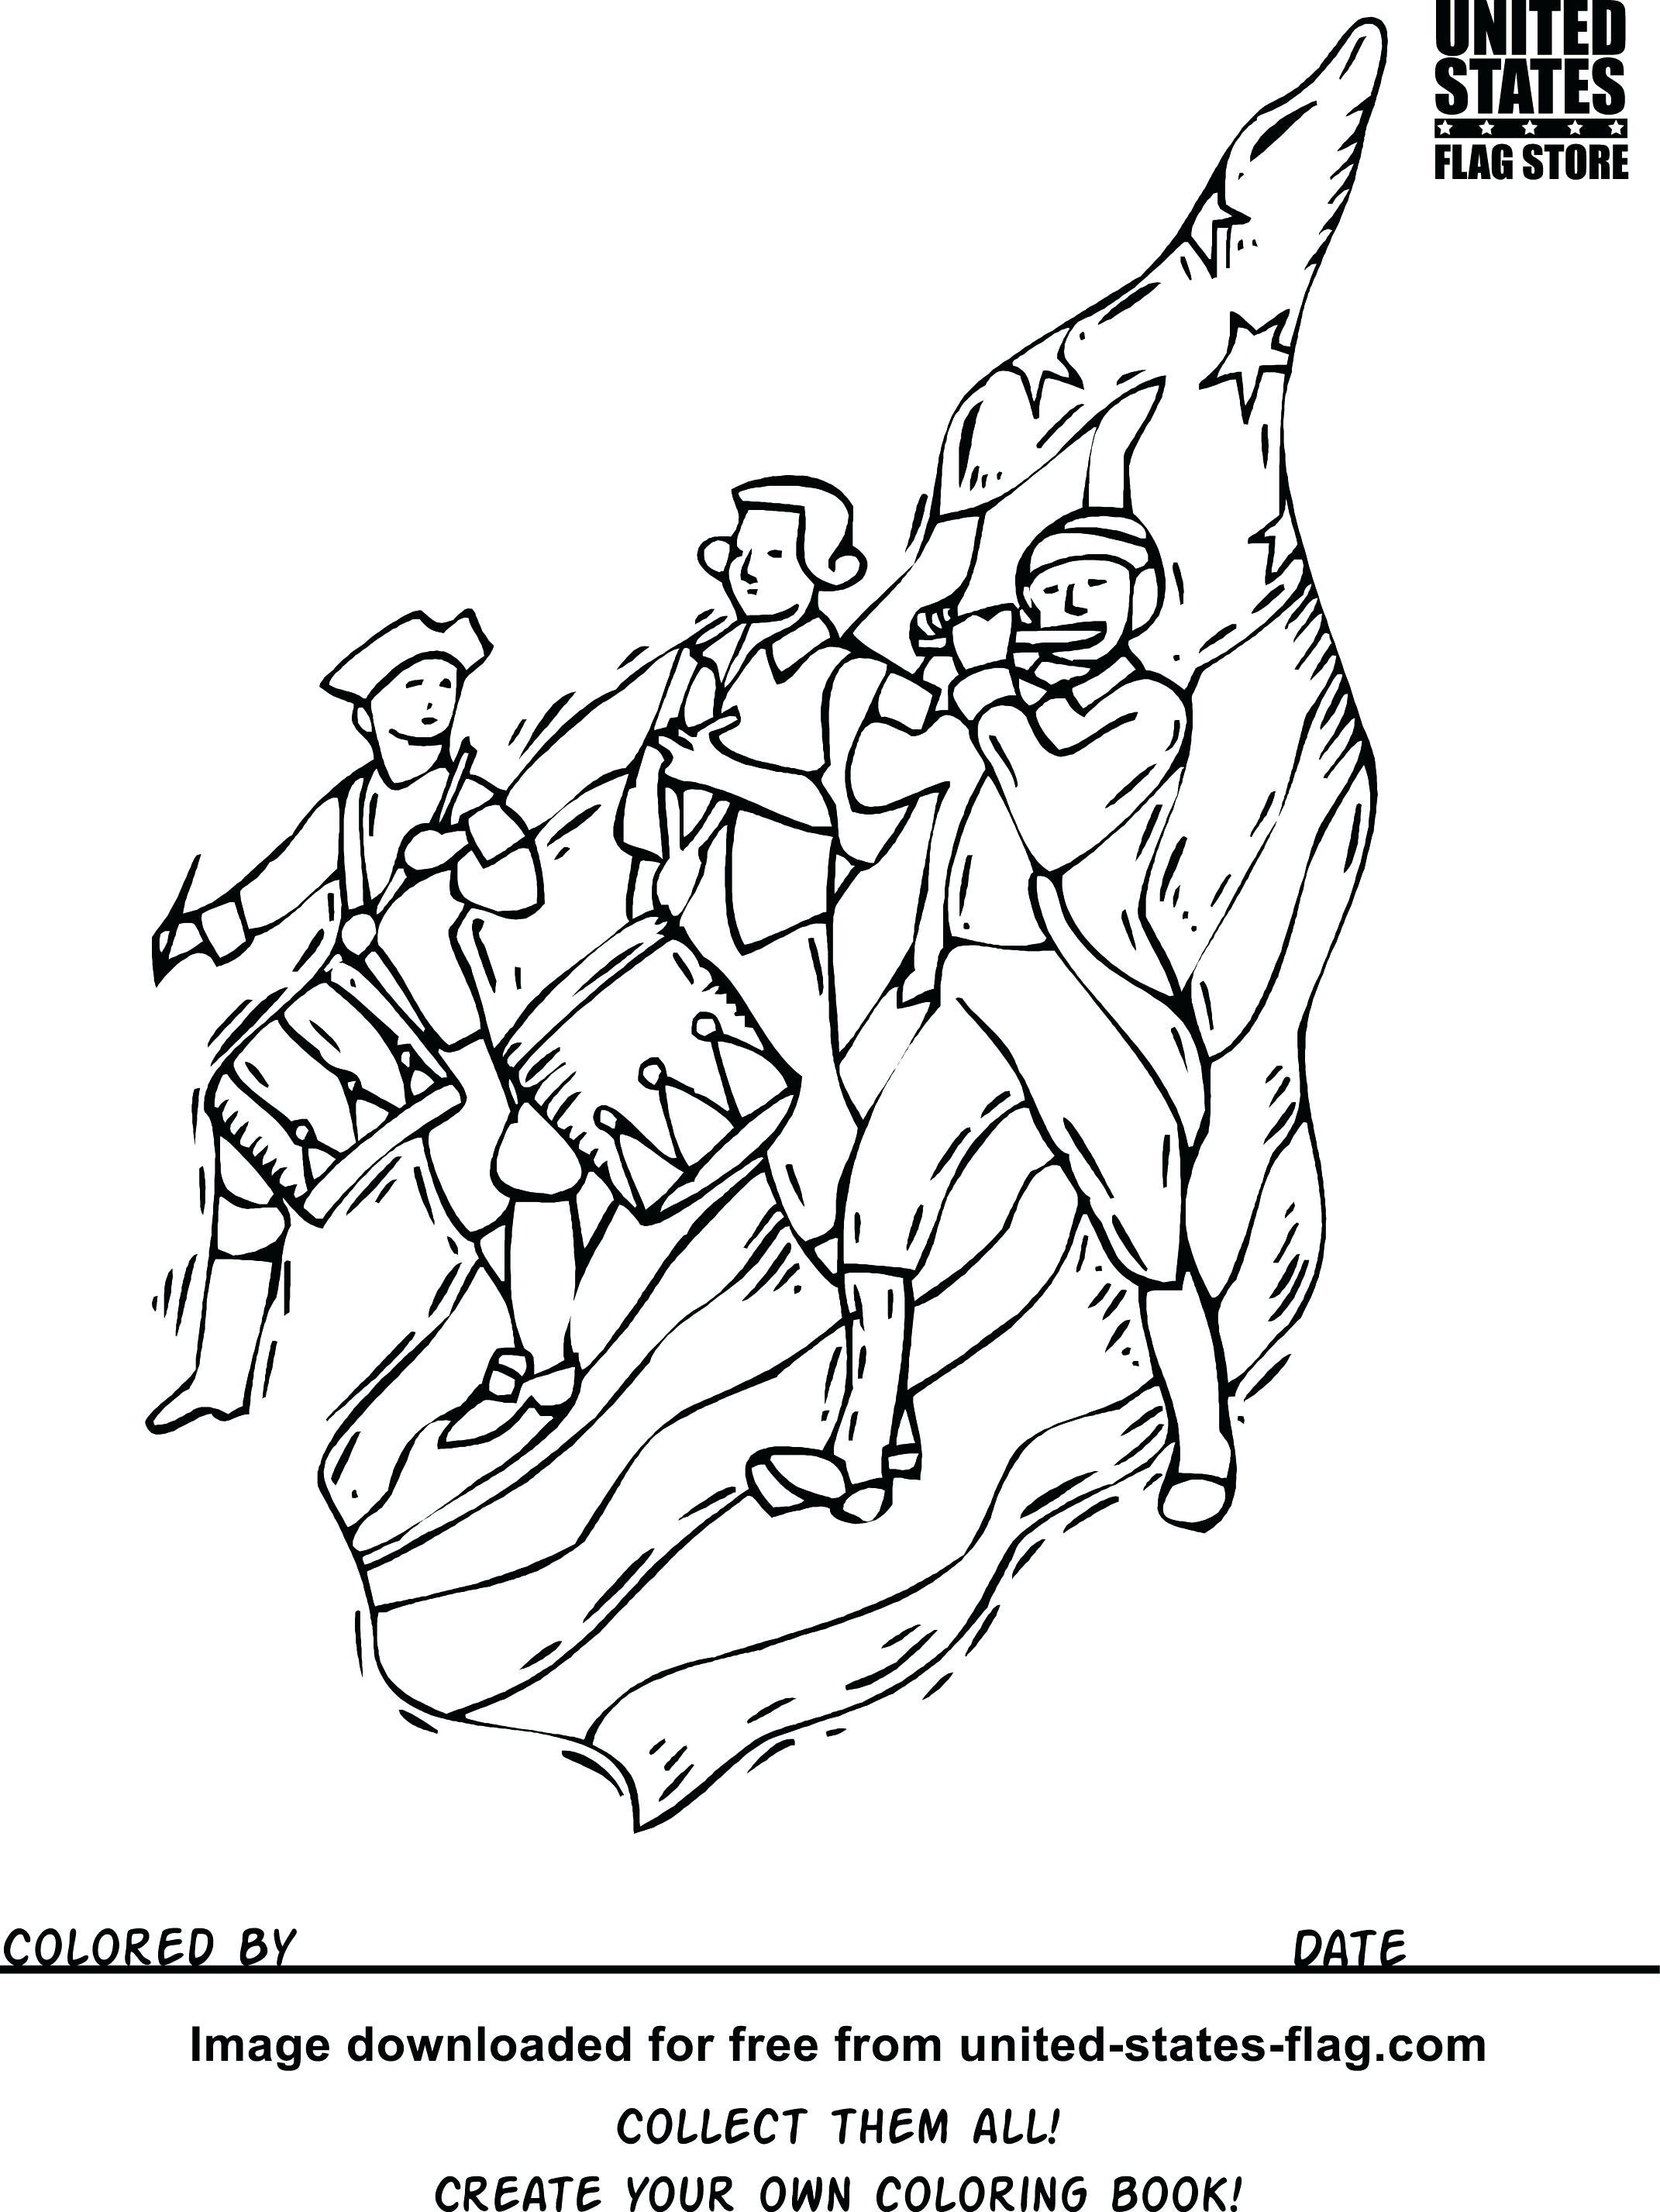 Civil War Soldier Coloring Page at GetDrawings | Free download